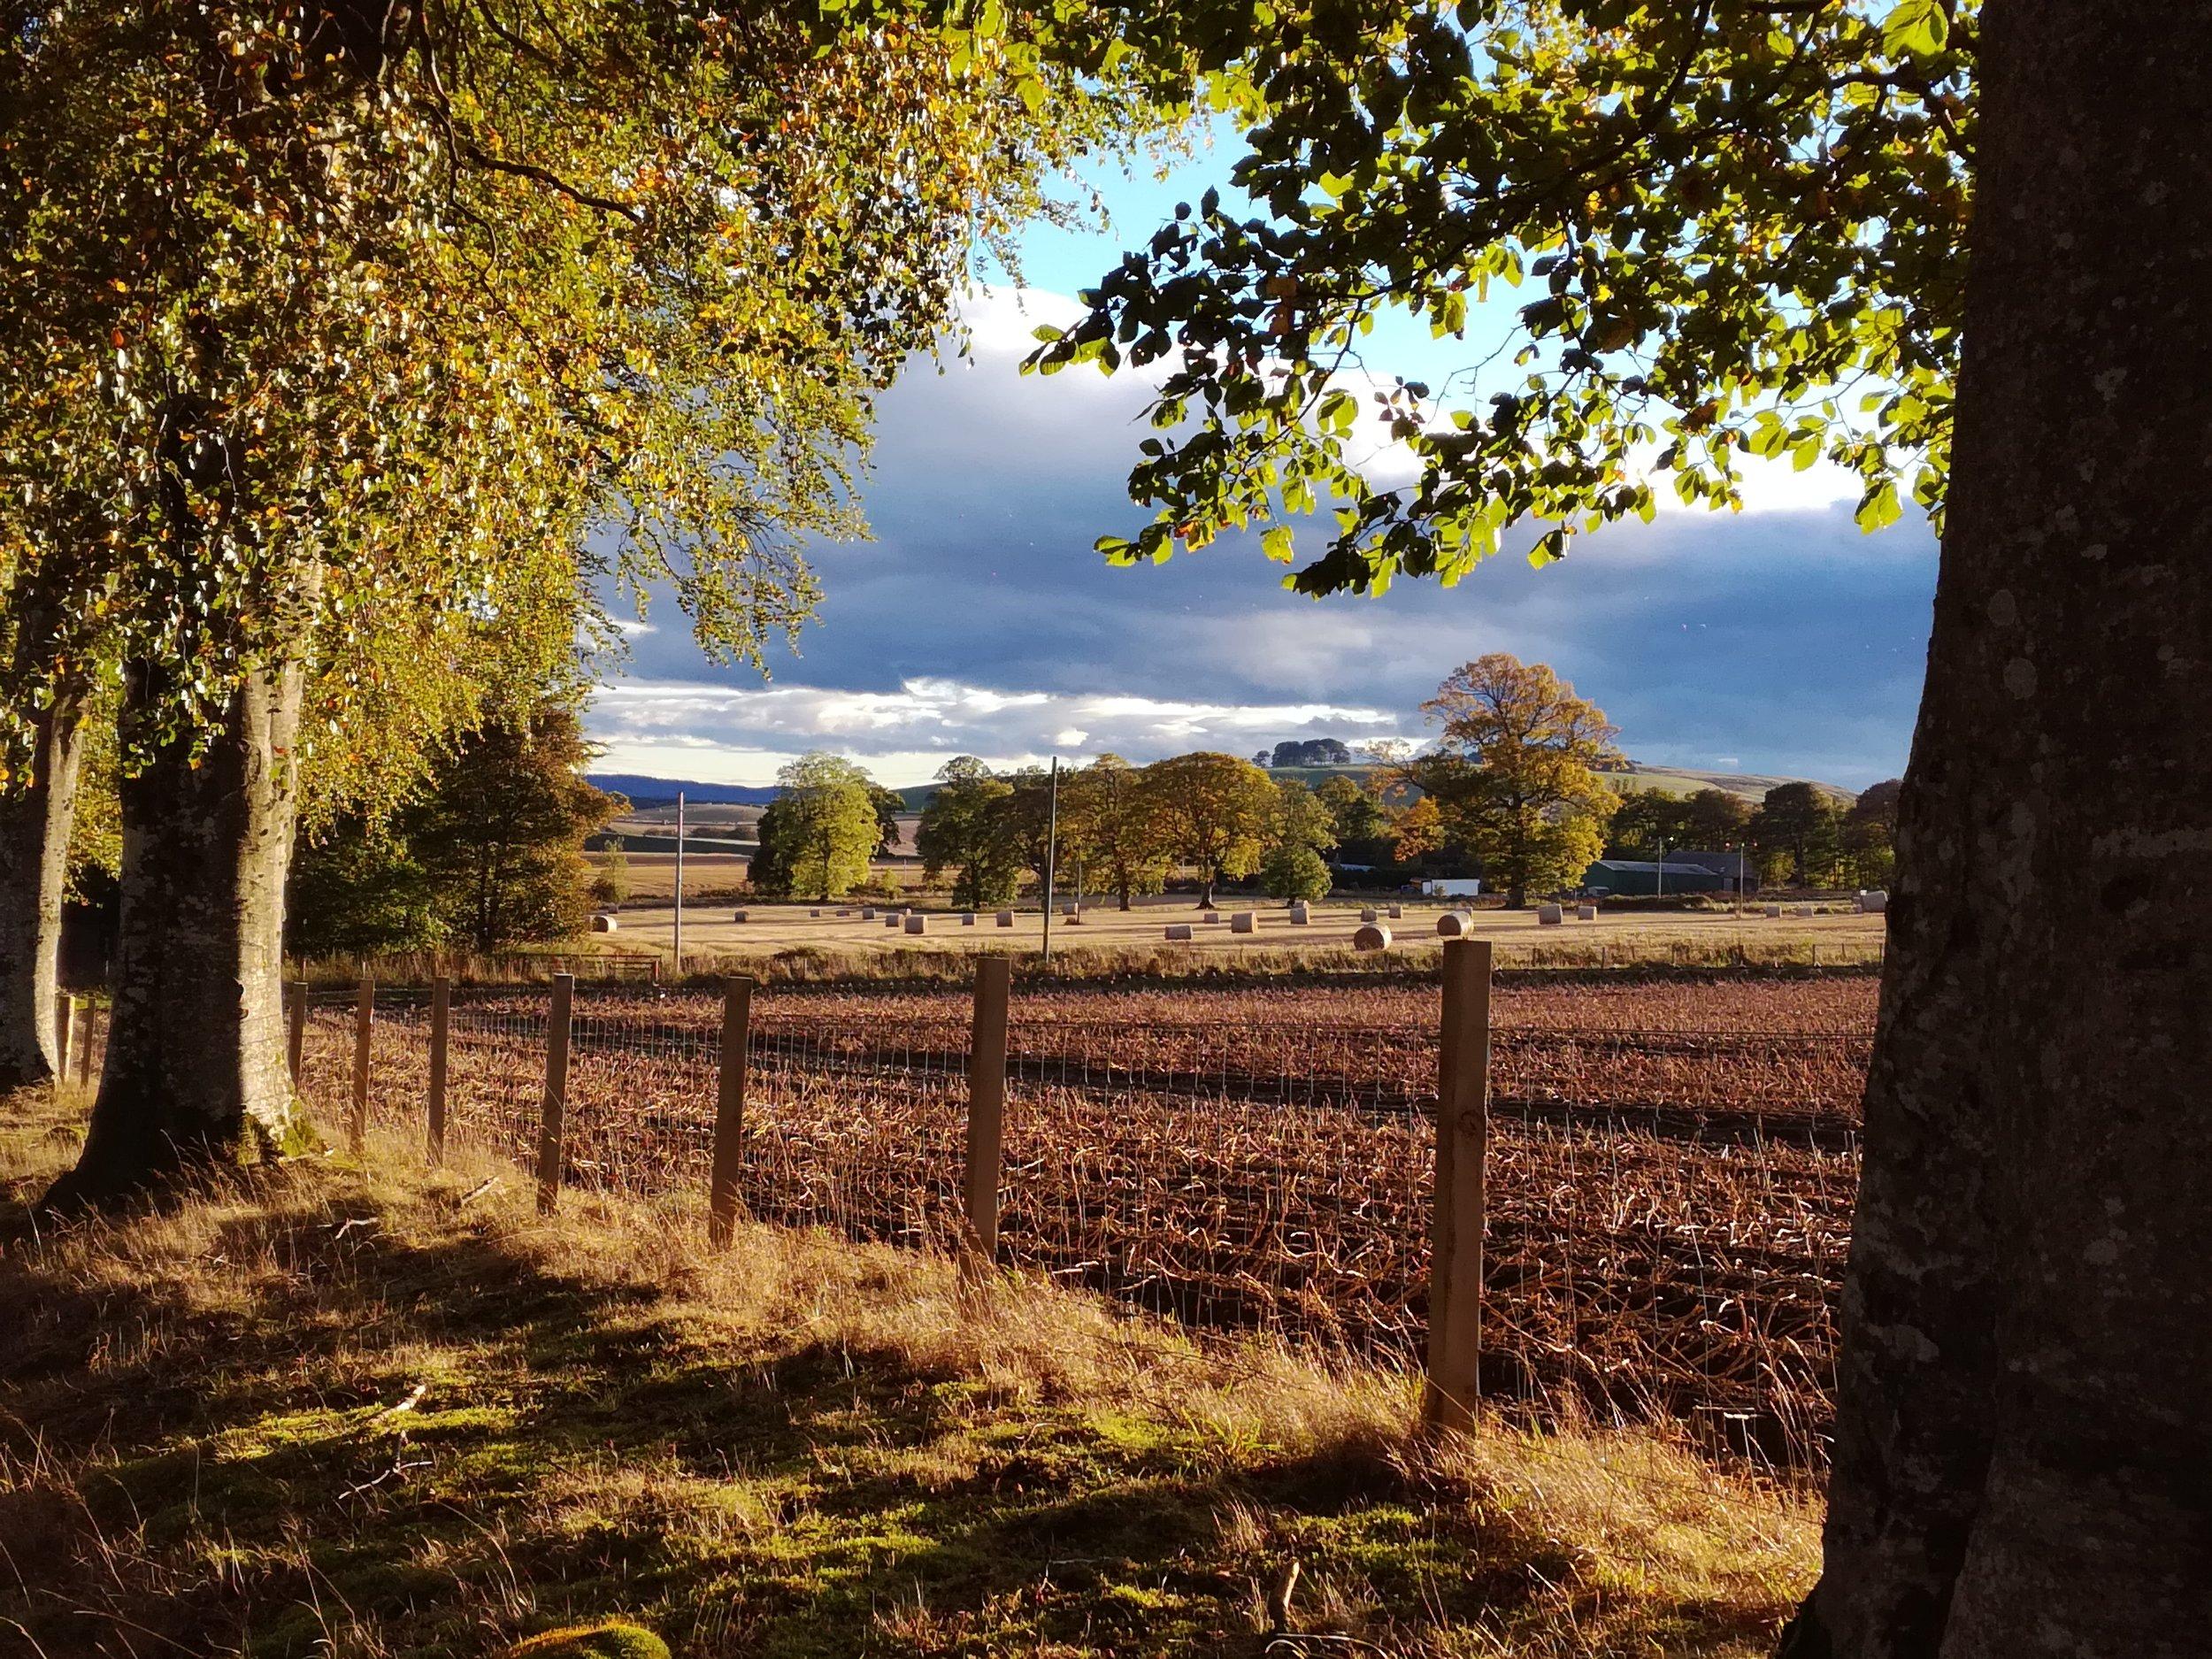 Autumn fields, Tour & Walk Scotland in small group adventures - Roaming Scotland.jpg.